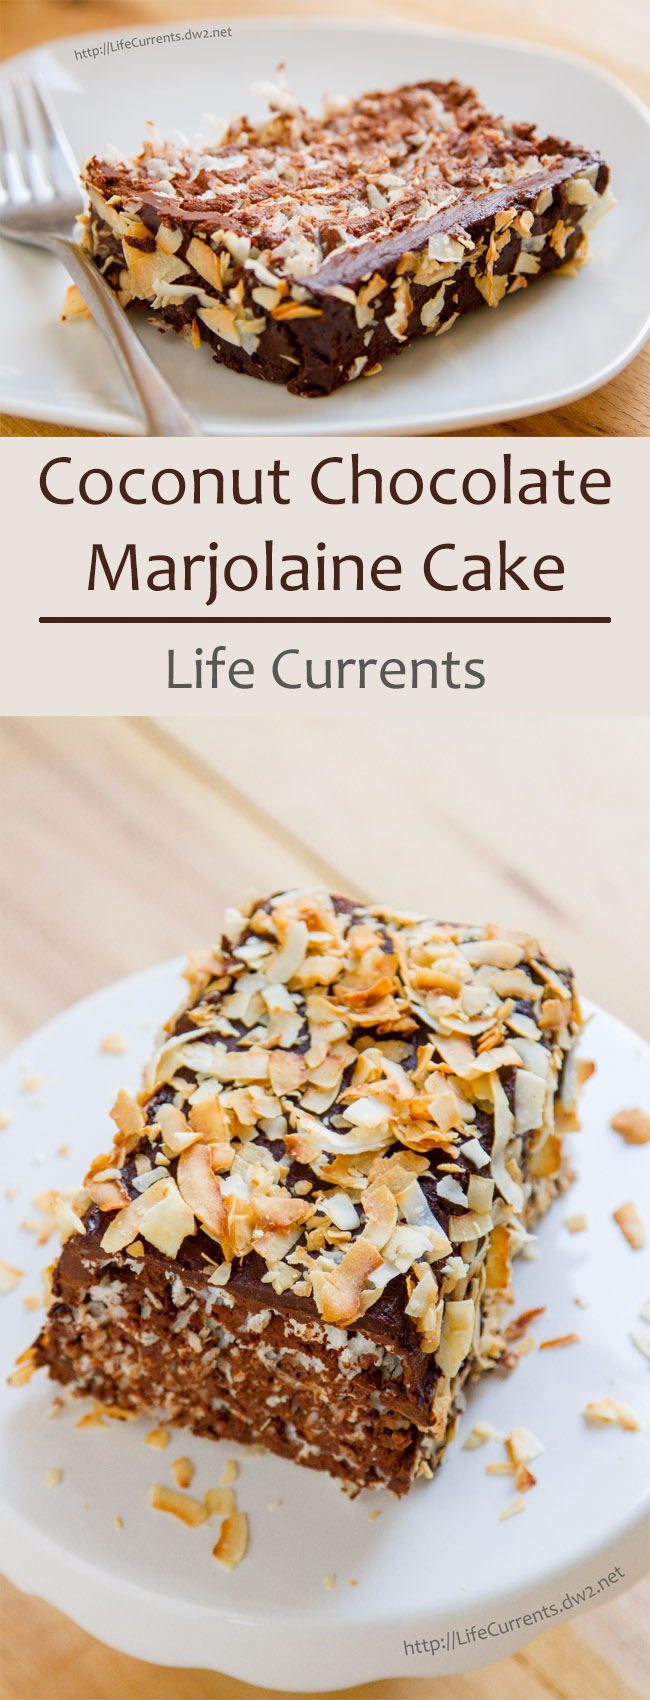 Coconut Chocolate Marjolaine